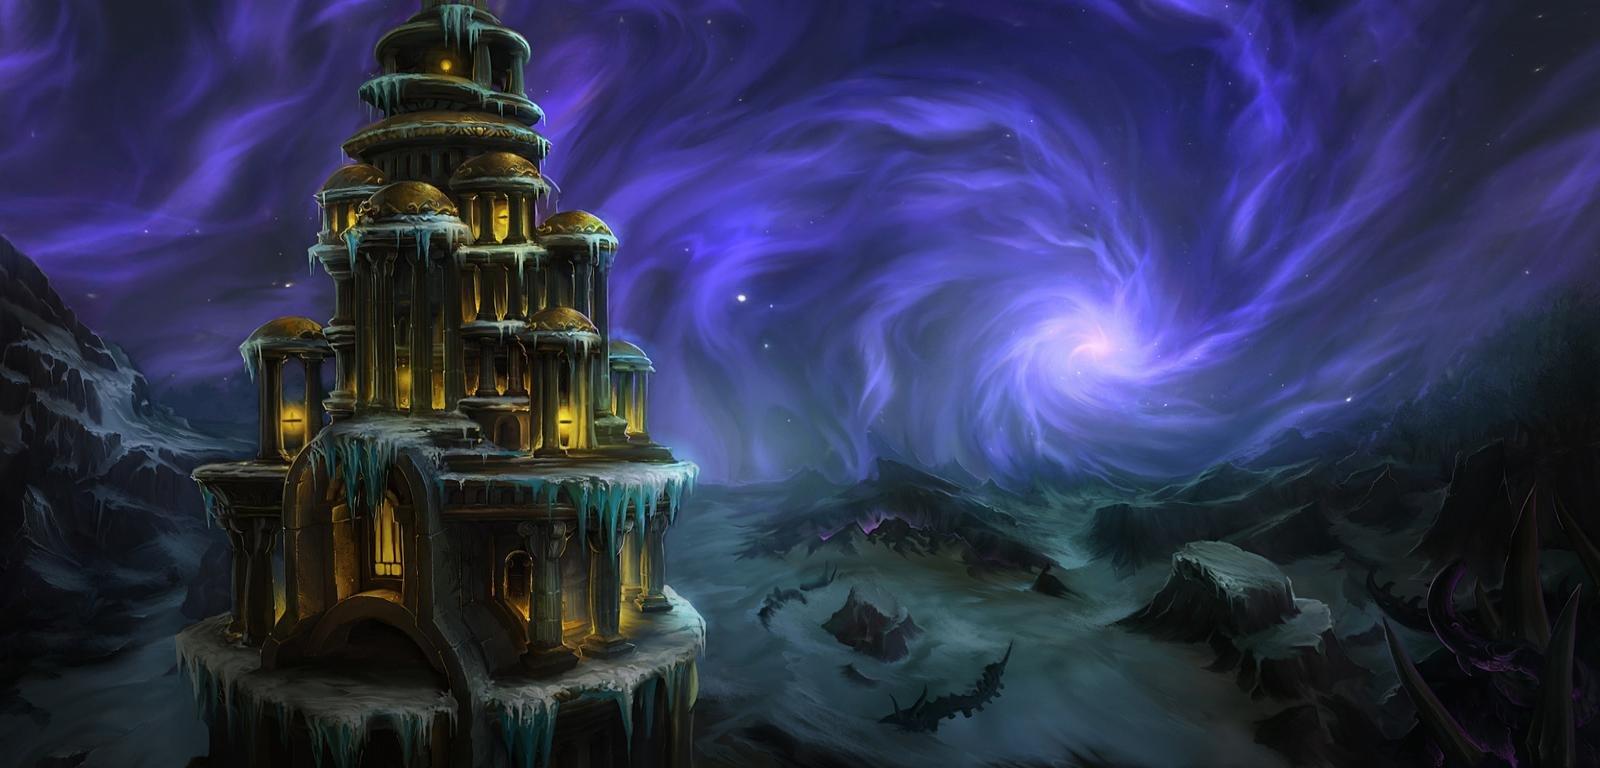 Download Hd 1600x768 World Of Warcraft Cataclysm Desktop